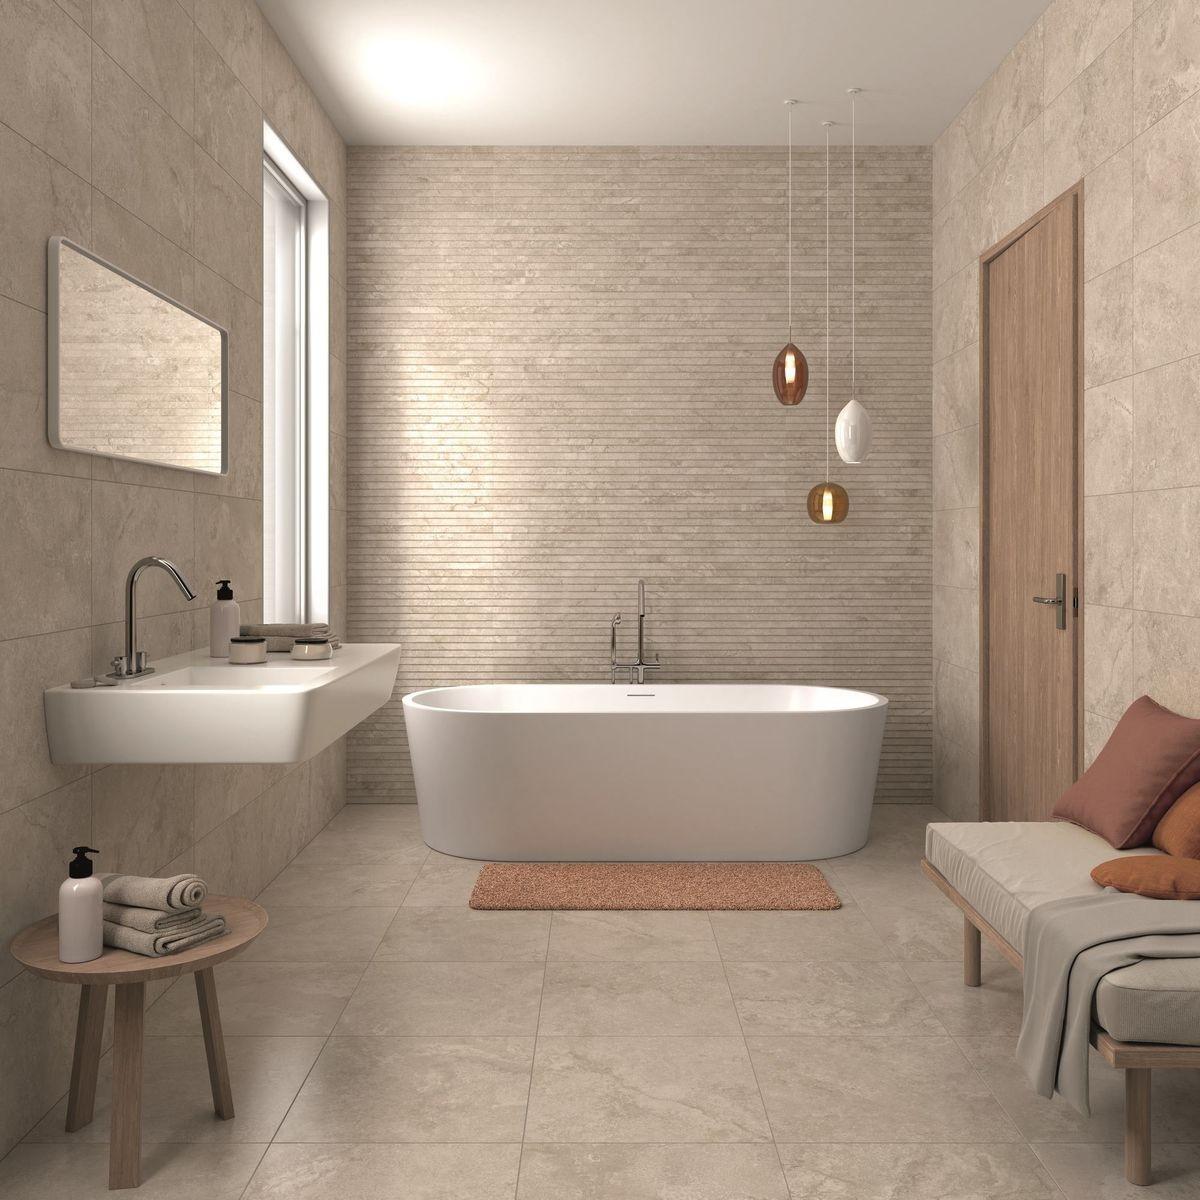 Soft marble bathroom